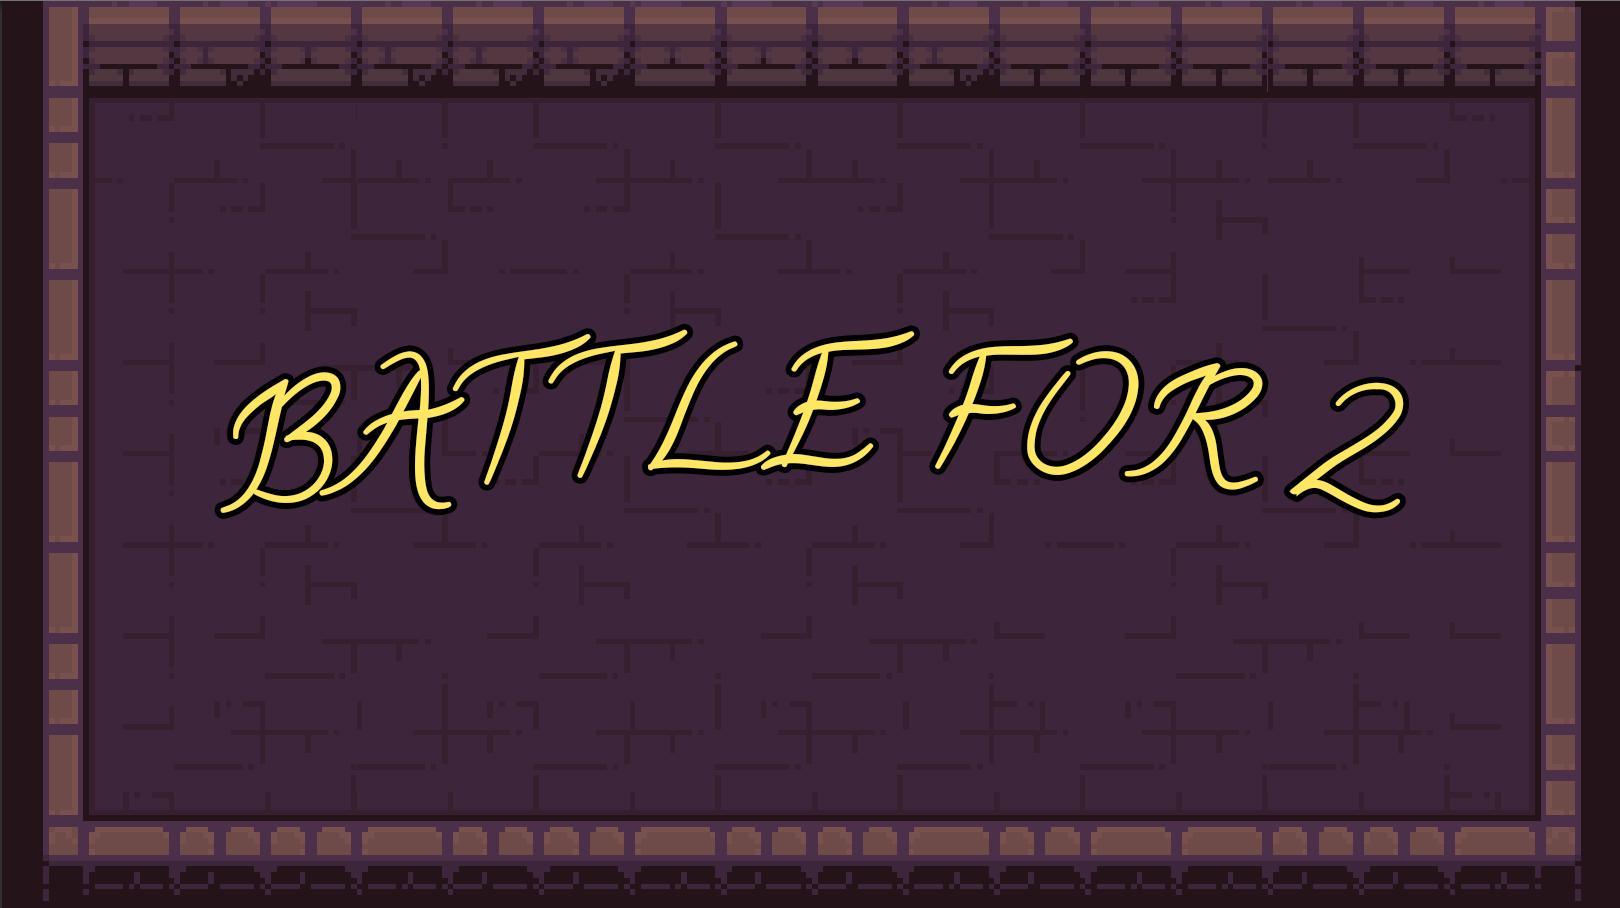 Battle for 2